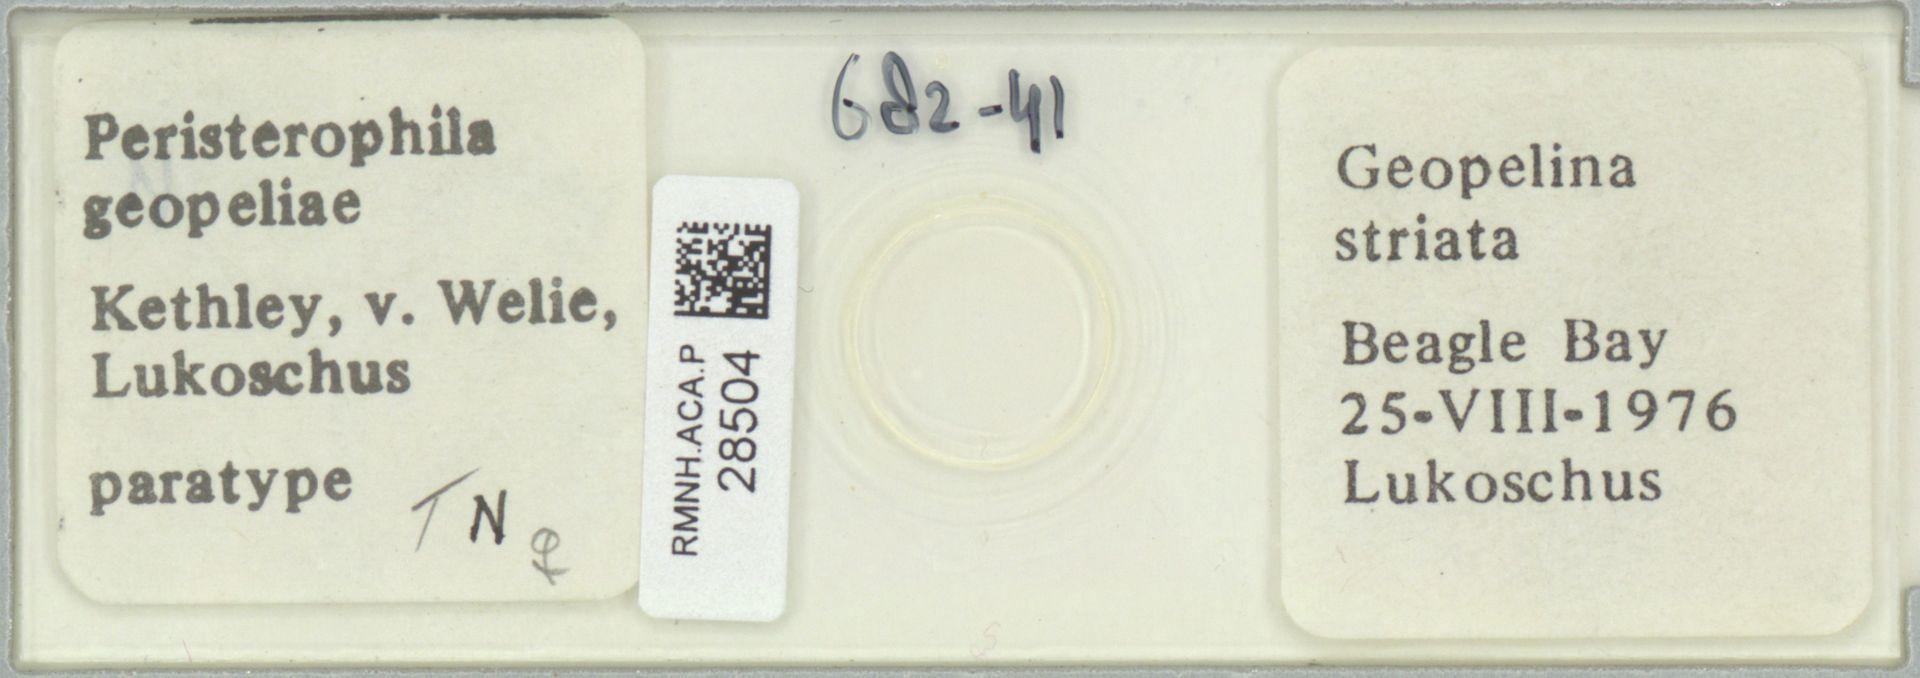 RMNH.ACA.P.28504 | Peristerophila geopeliae Kethley, v. Welie, Lukoschus